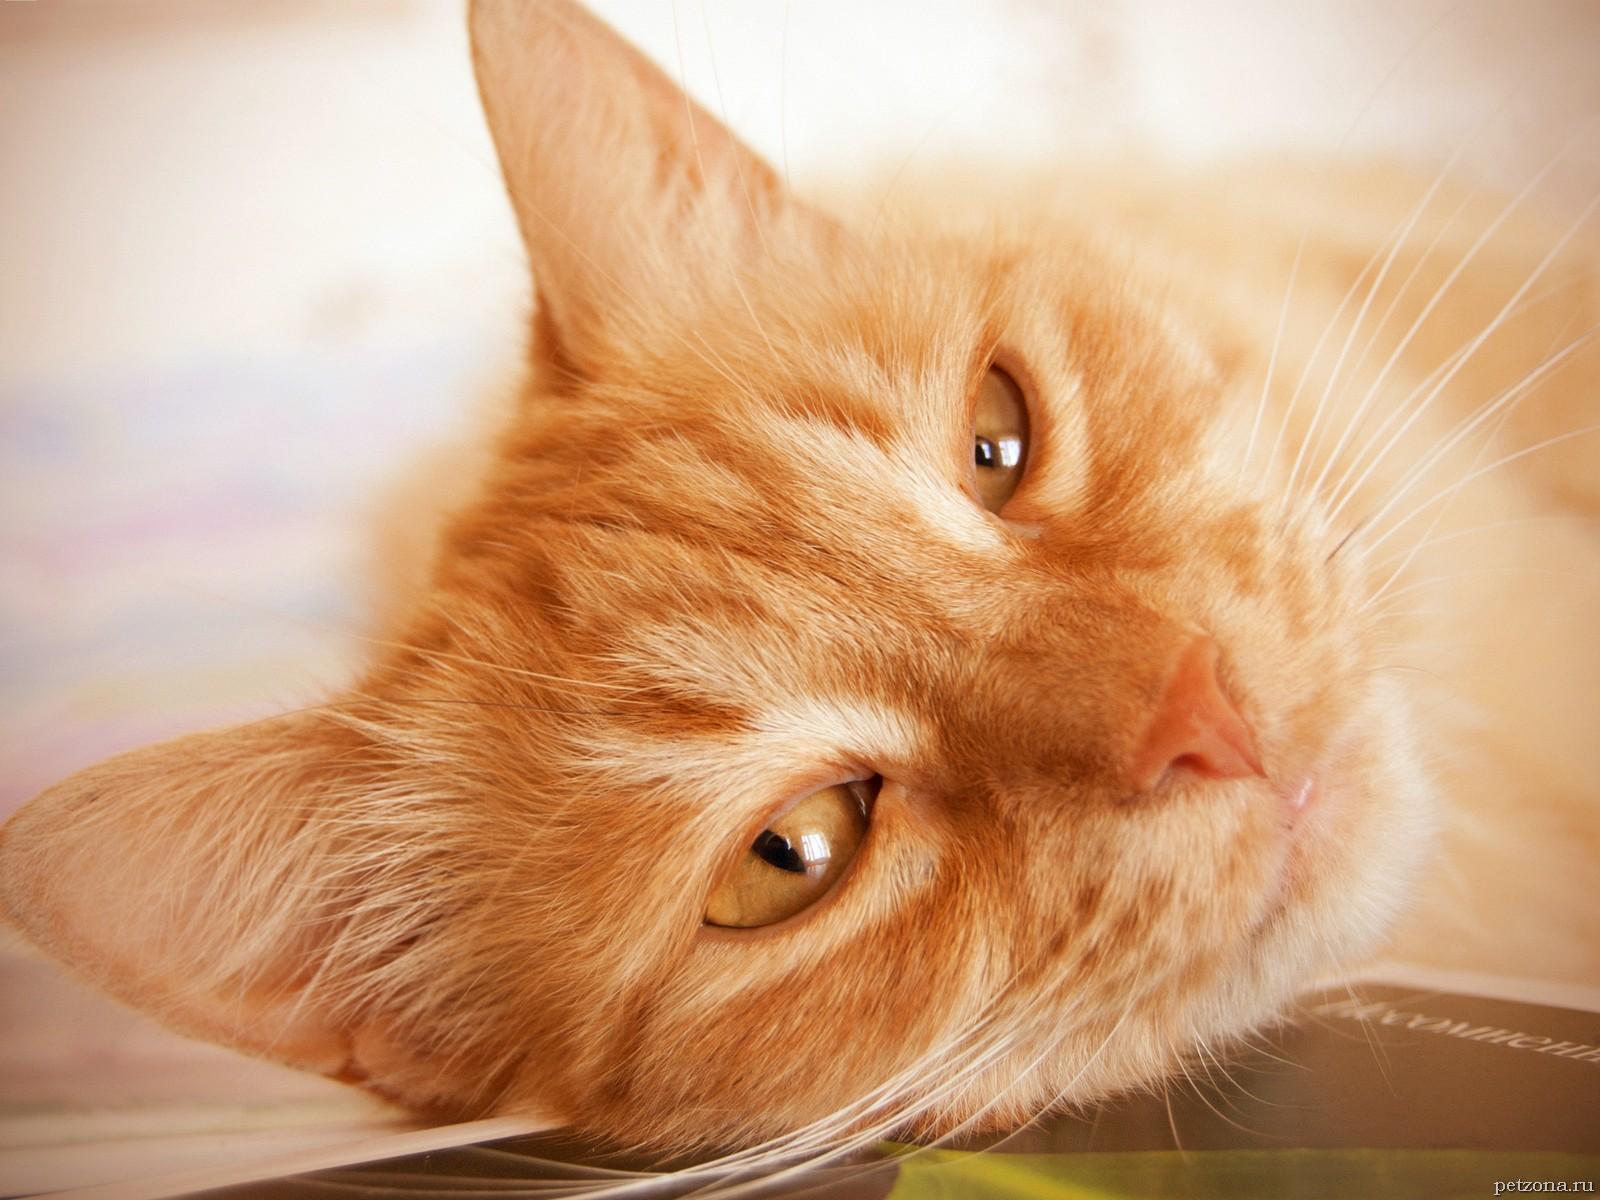 Дневник кота Плинтуса. Часть 1 (1.2)